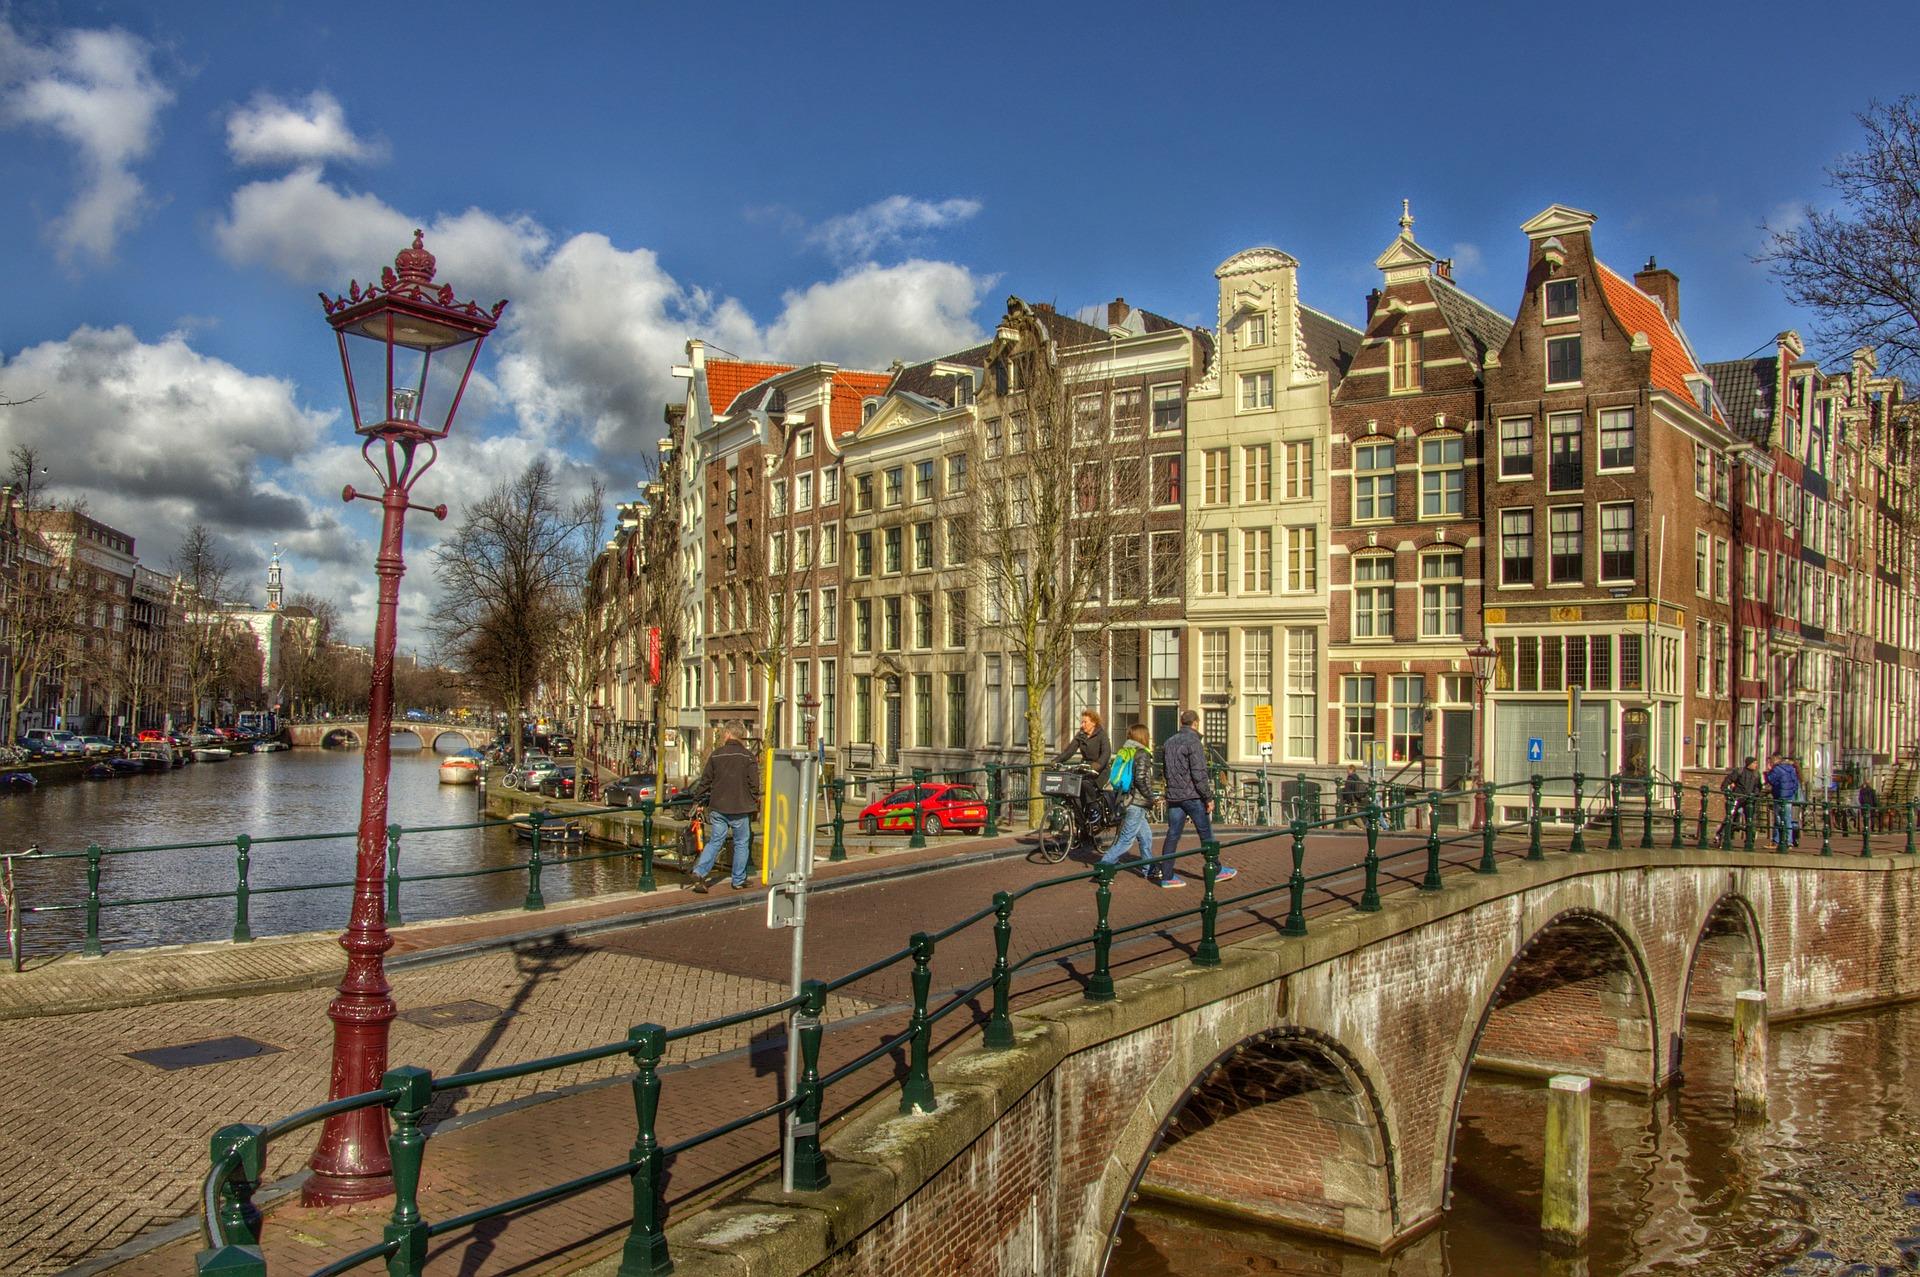 amsterdam-686460_1920.jpg